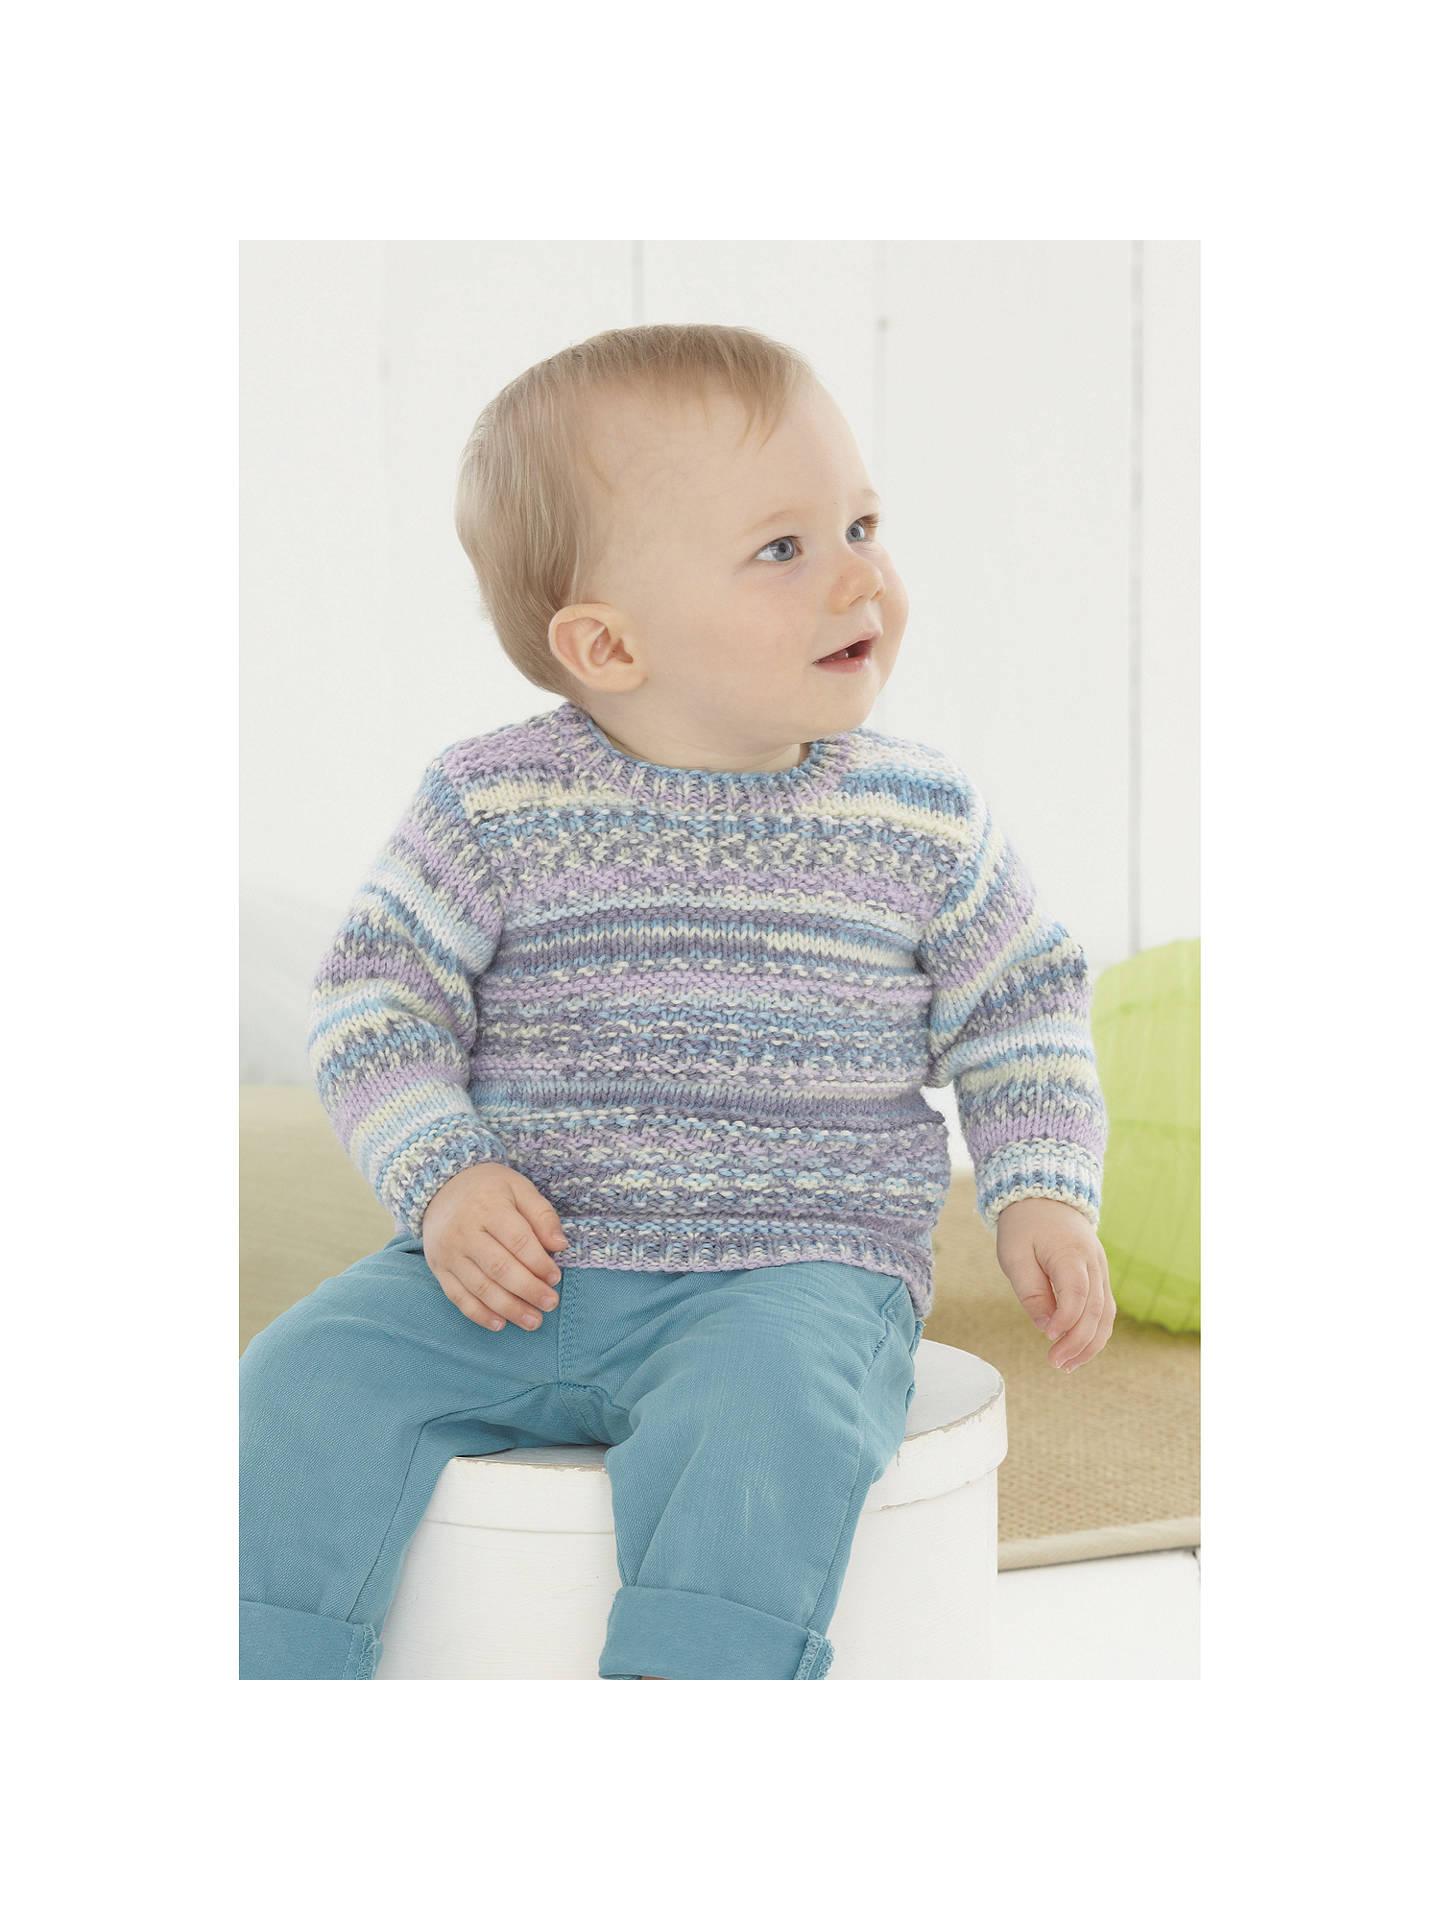 Sirdar Baby Crofter Fair Isle Friends Knitting Pattern Booklet 0496